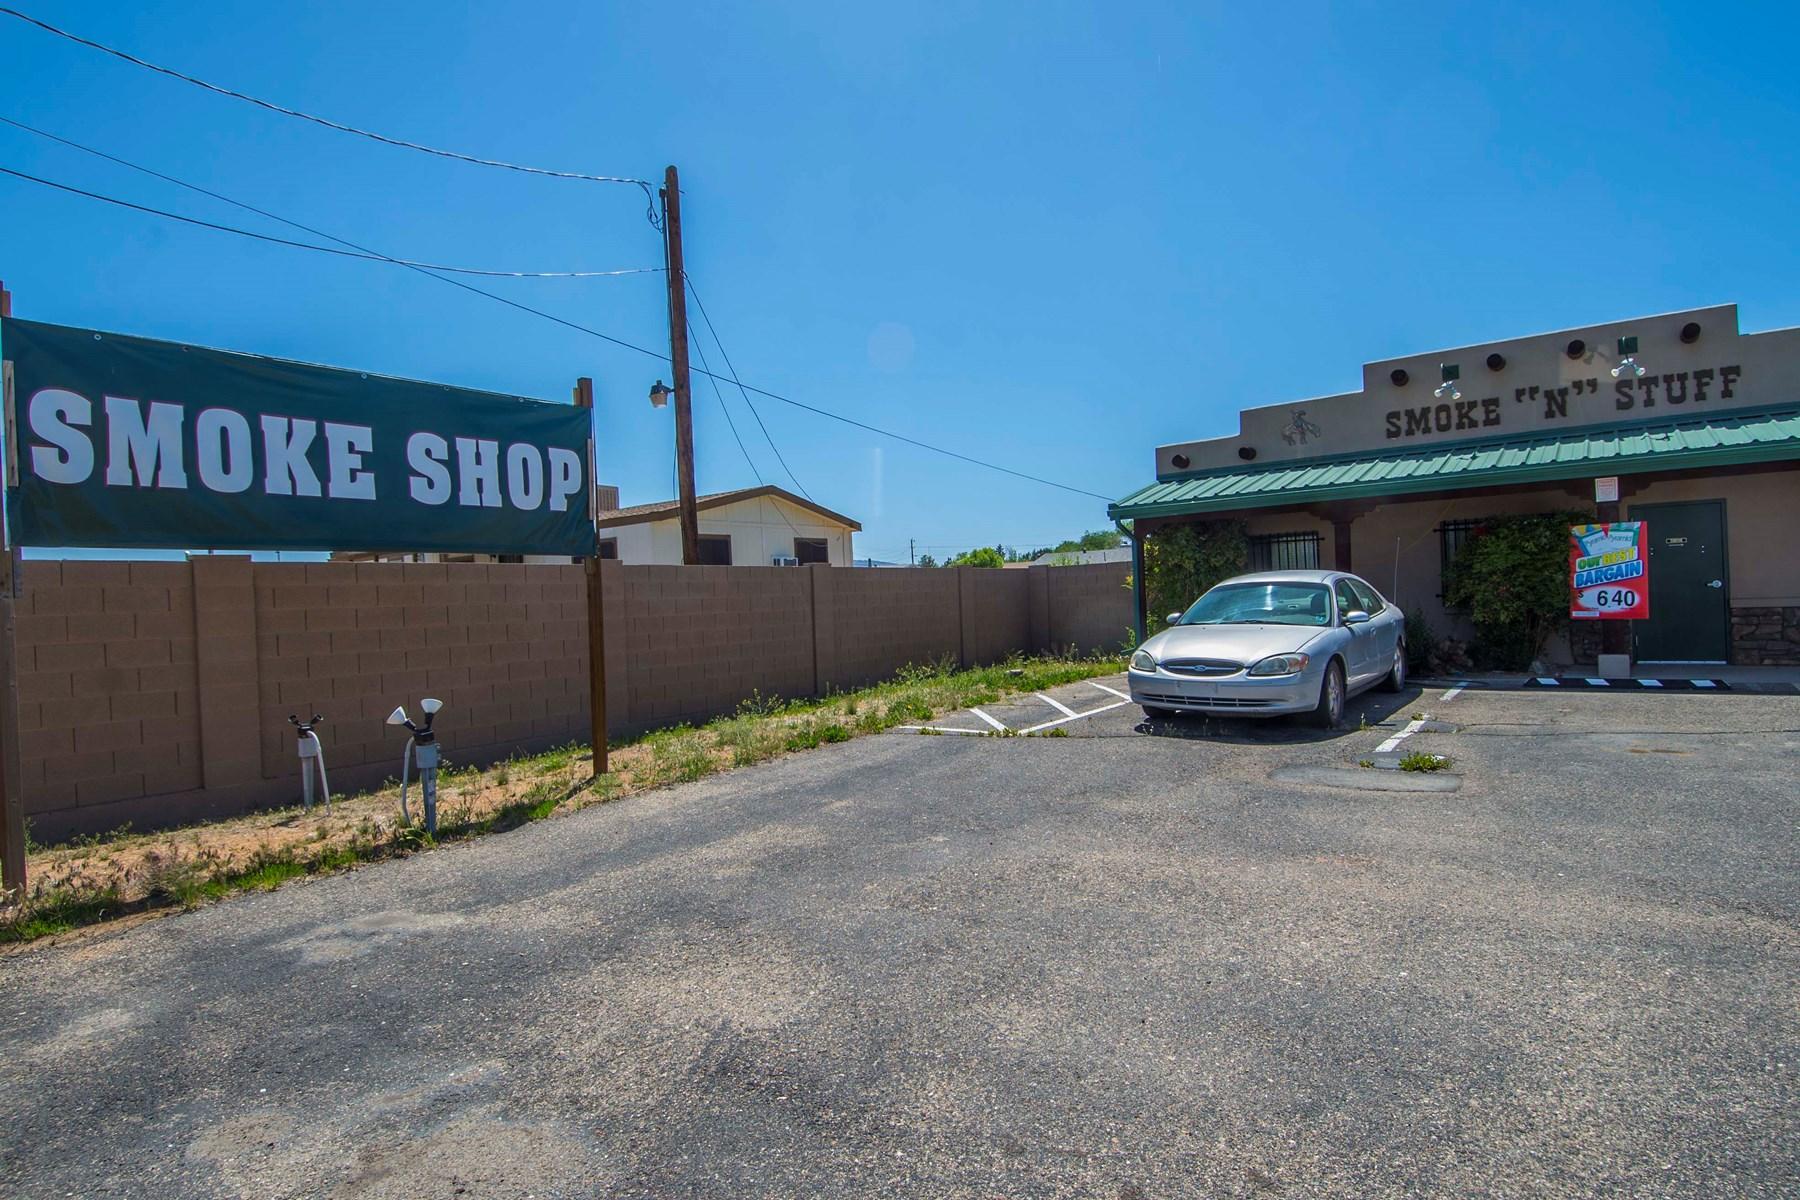 Smokeshop for Sale in Northern Arizona Very Successful!